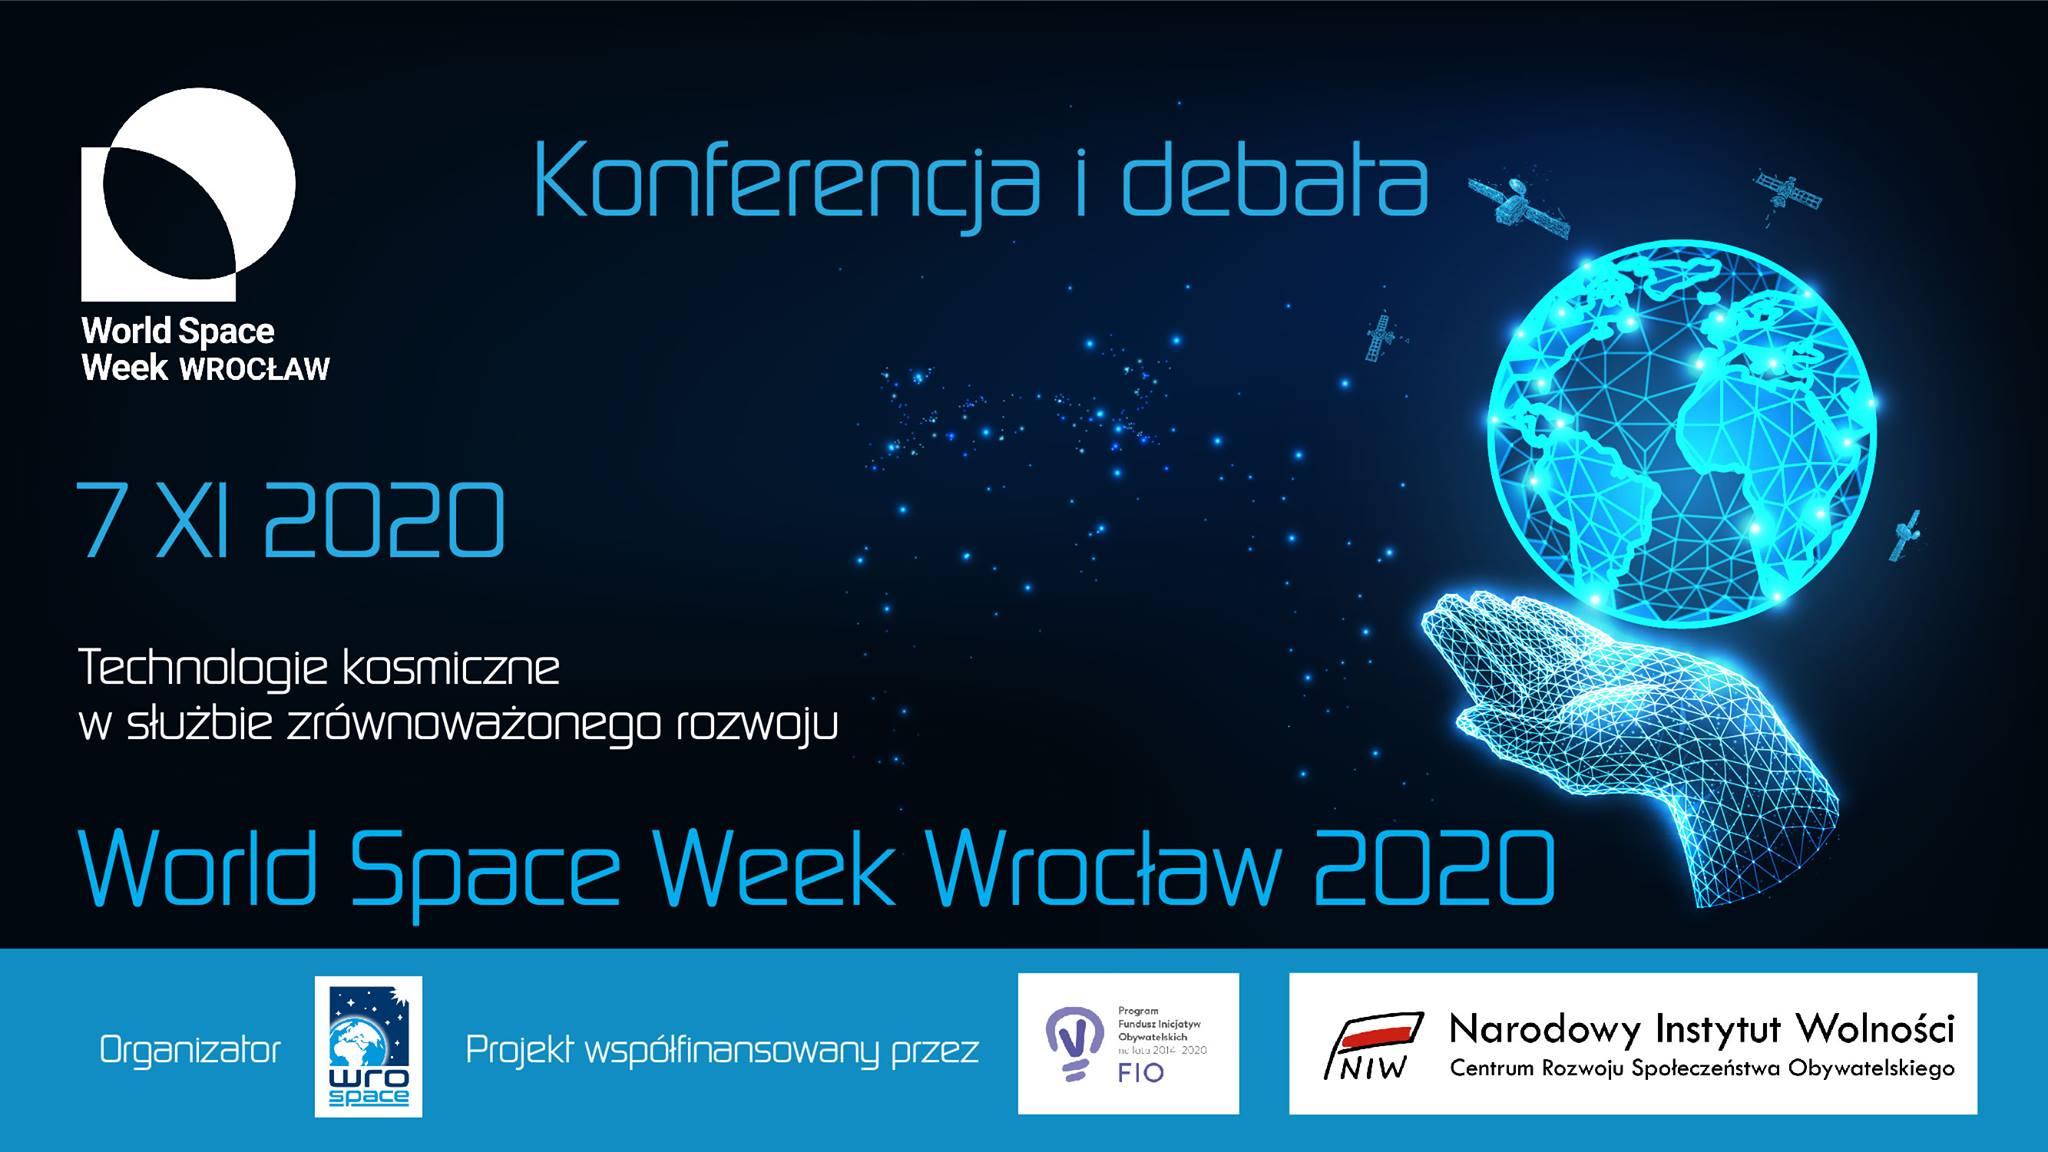 Konferencja idebata - World Space Week Wrocław 2020 @ Online